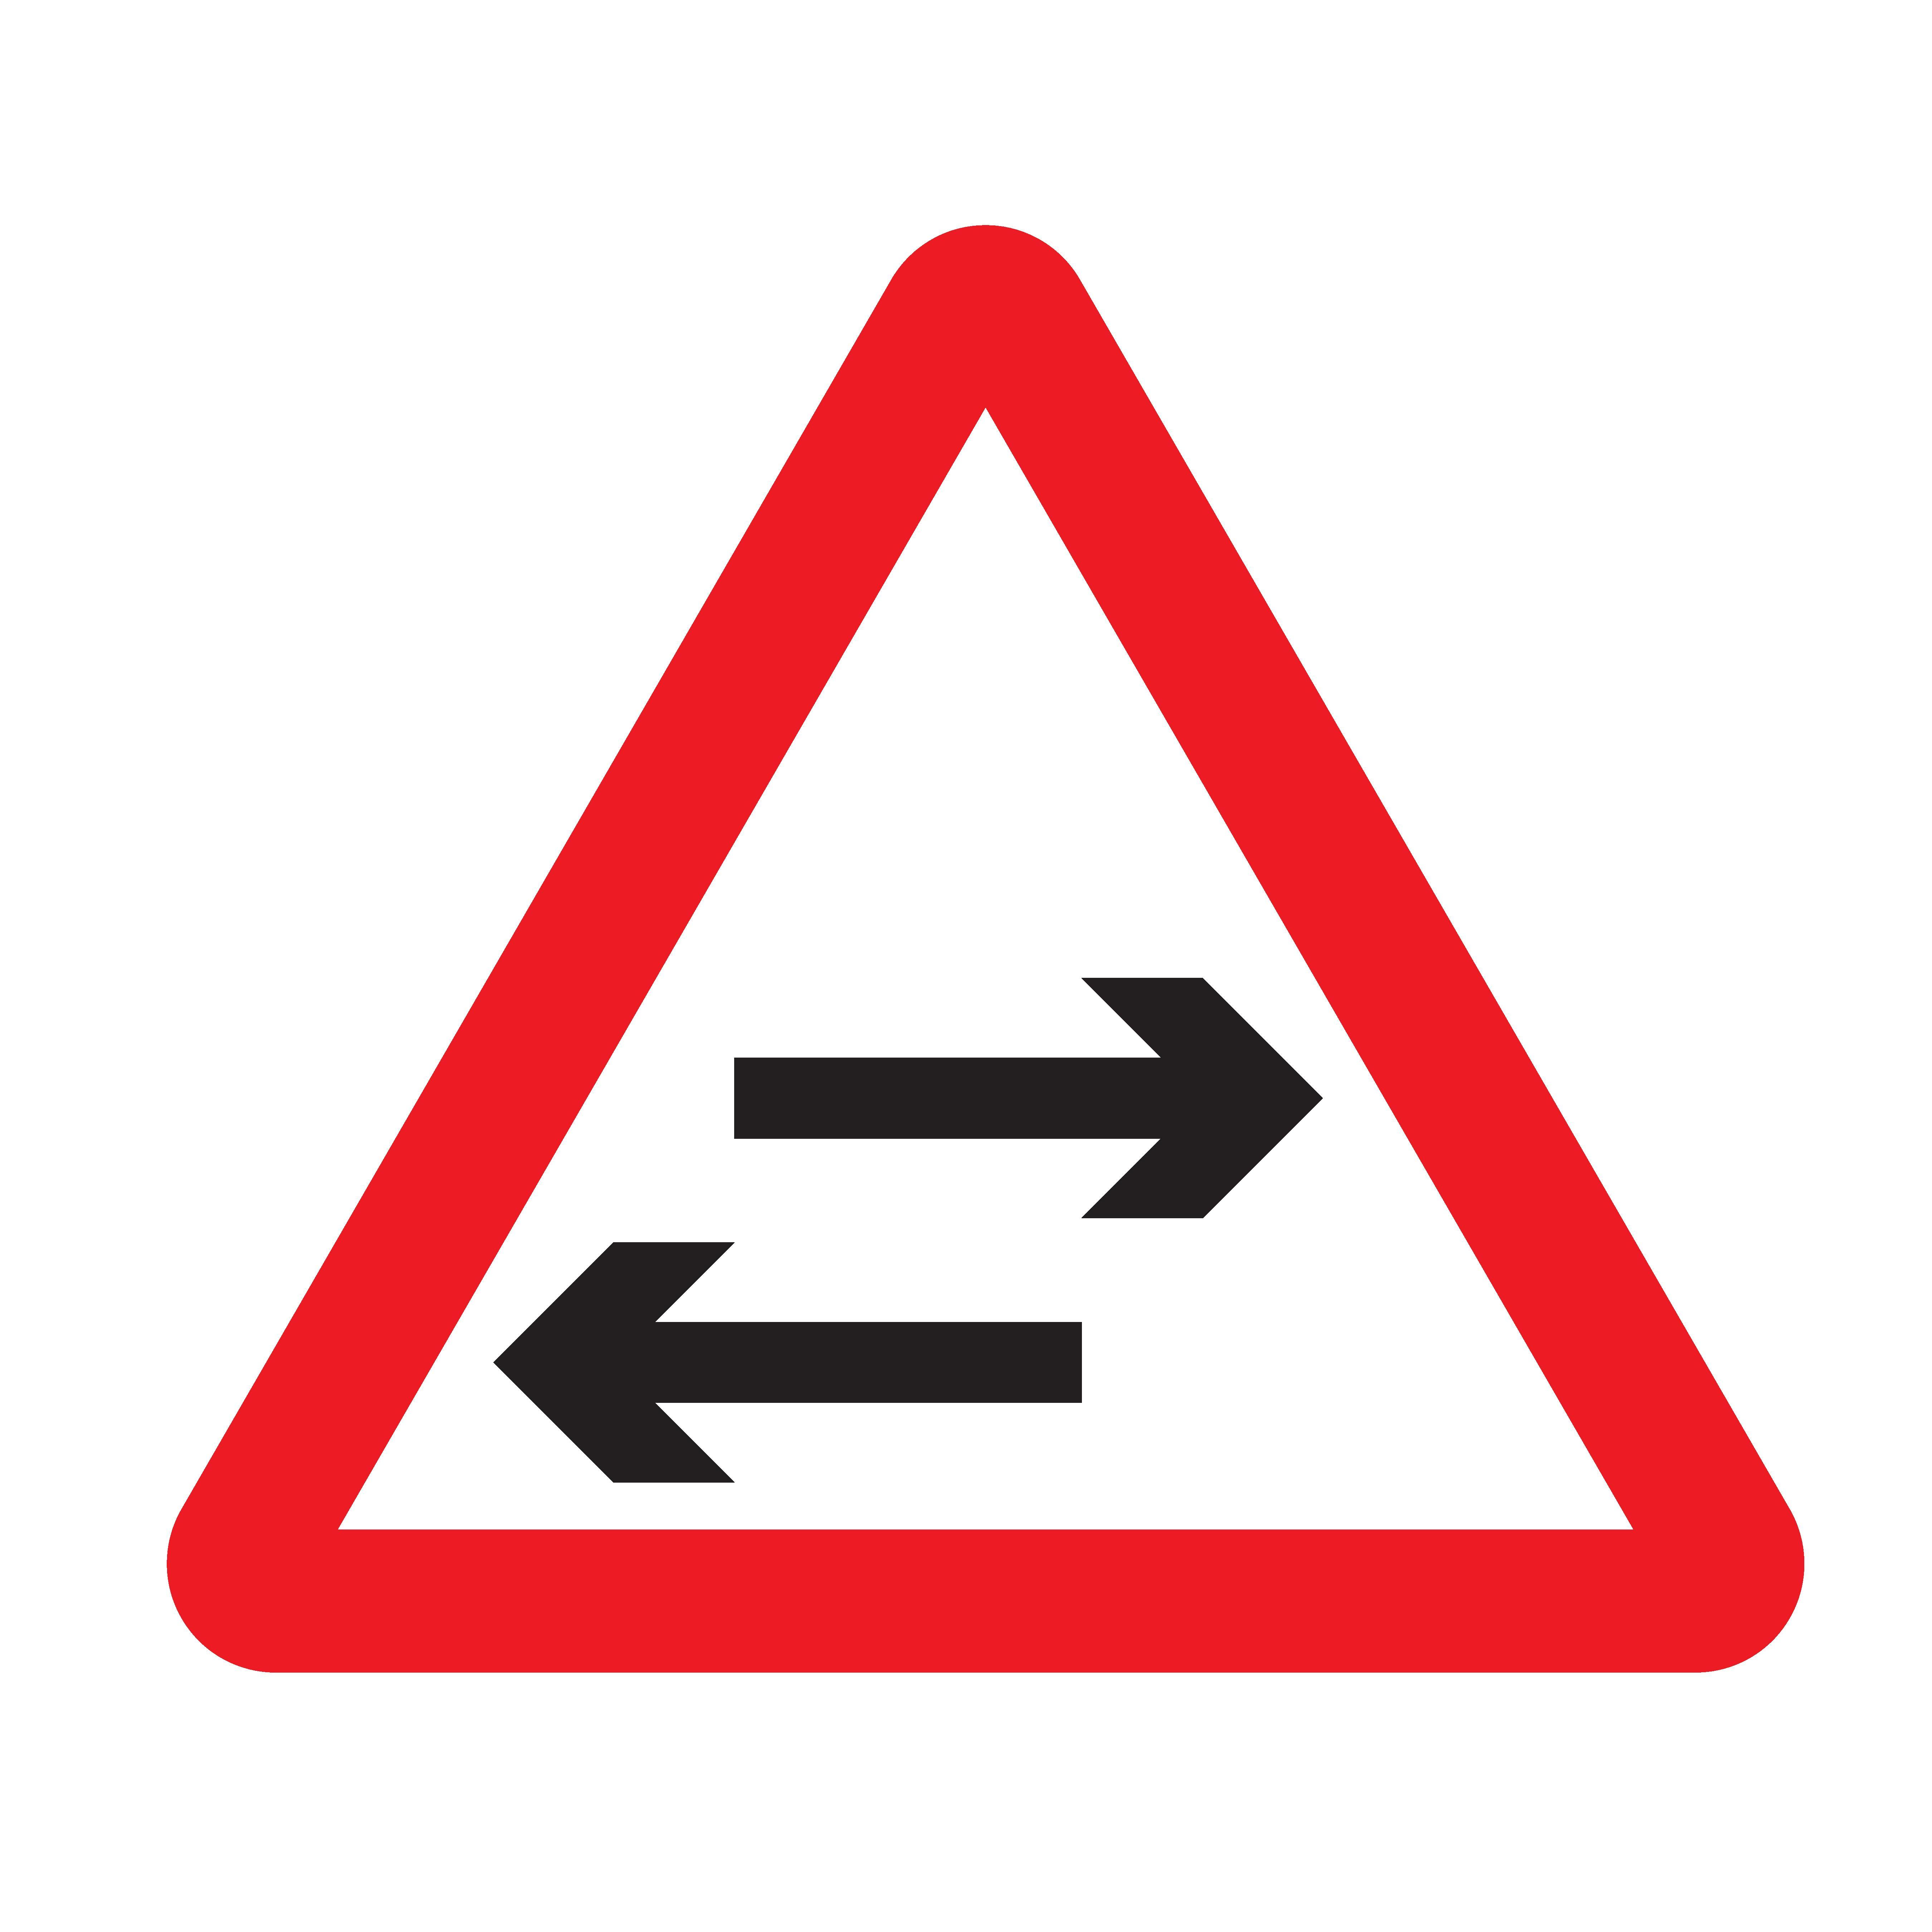 Reflective Warning Signs - Two Way Traffic Ahead|Seton Canada |Two Way Traffic Ahead Sign